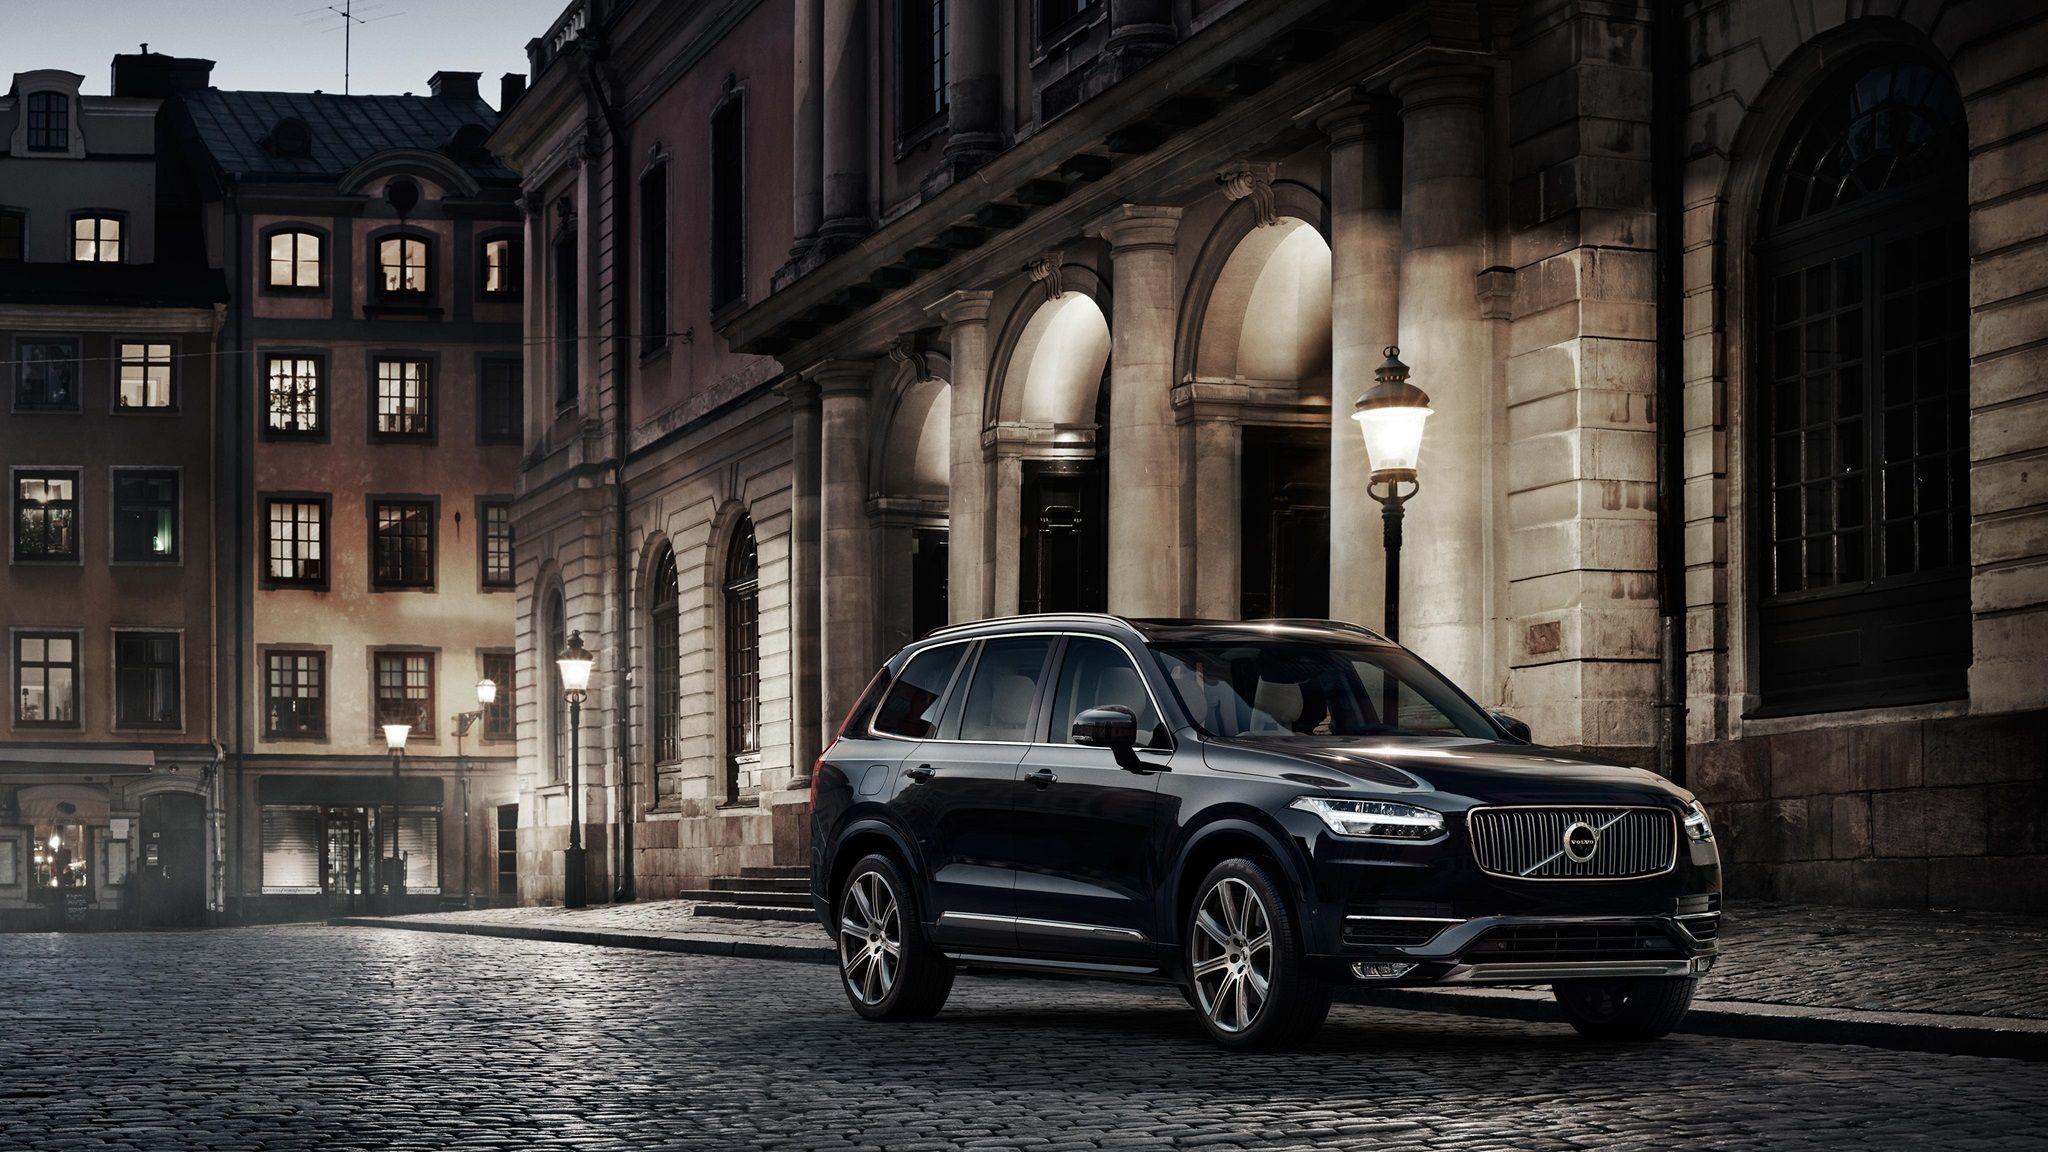 The All New Xc90 Gallery Volvo Cars Otomobil Araba Arabalar